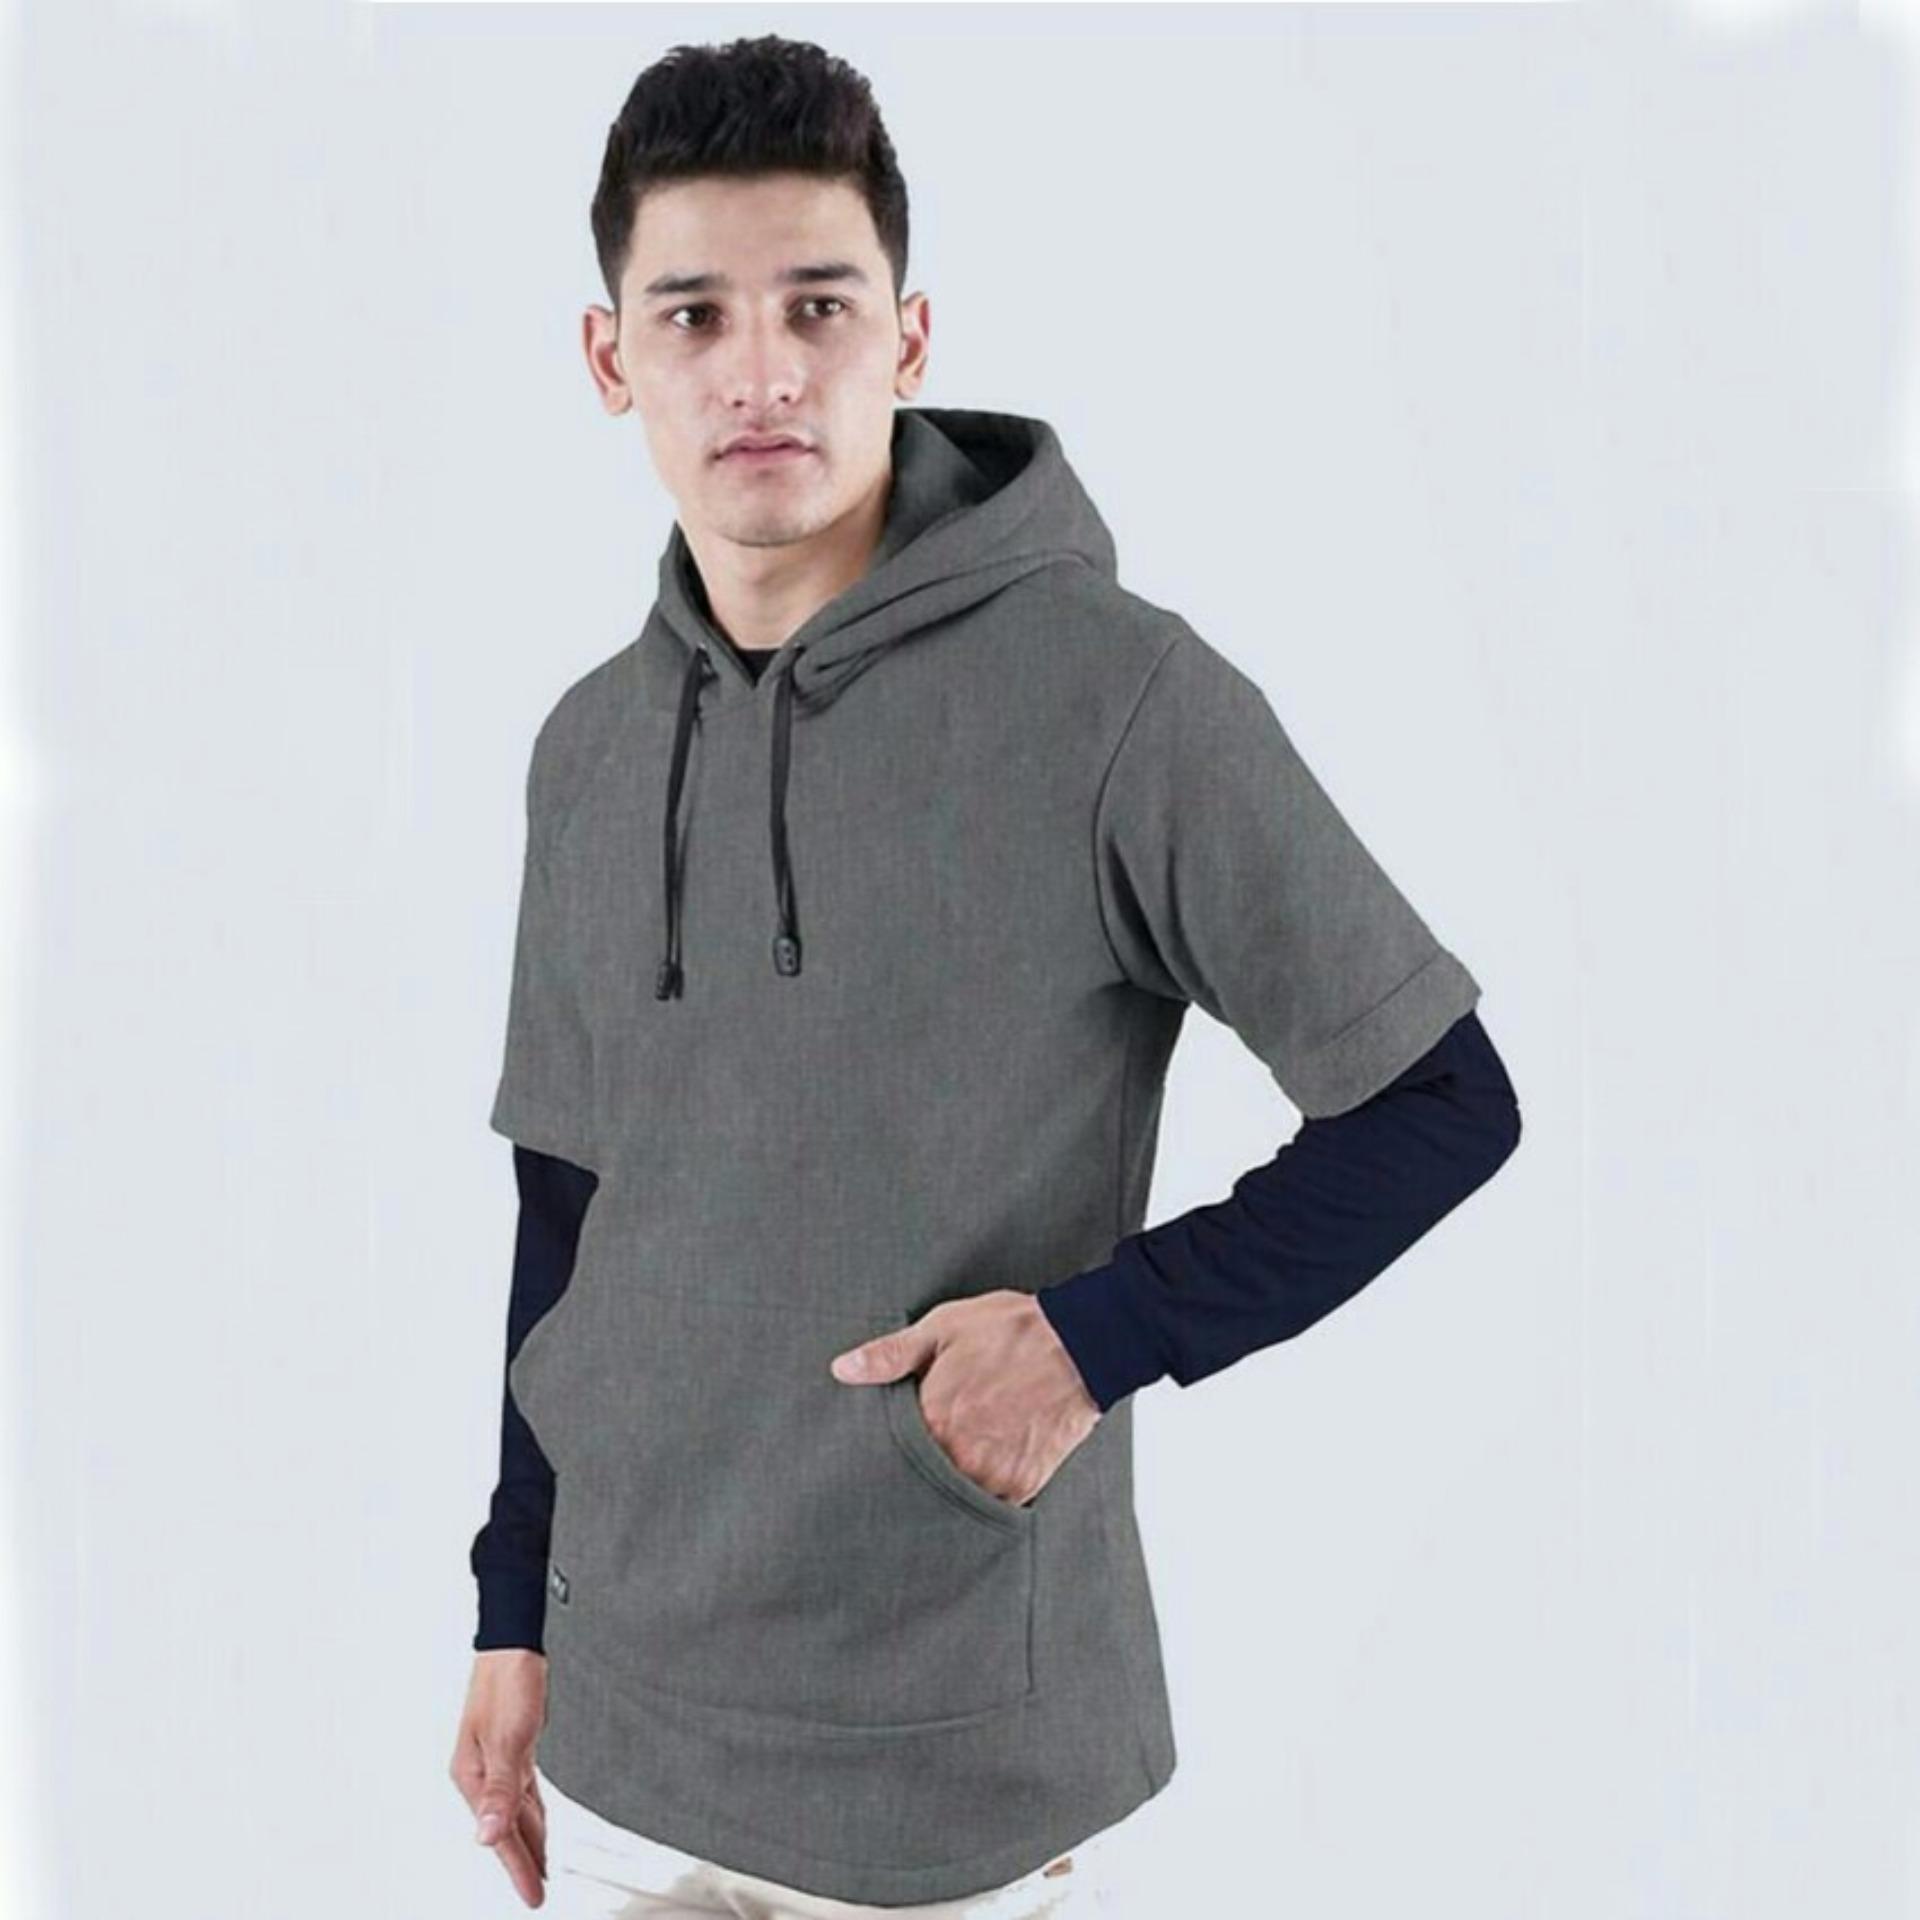 Beli Jaket Sweater Hoodie Pria Atx Abu Tua Jawa Barat